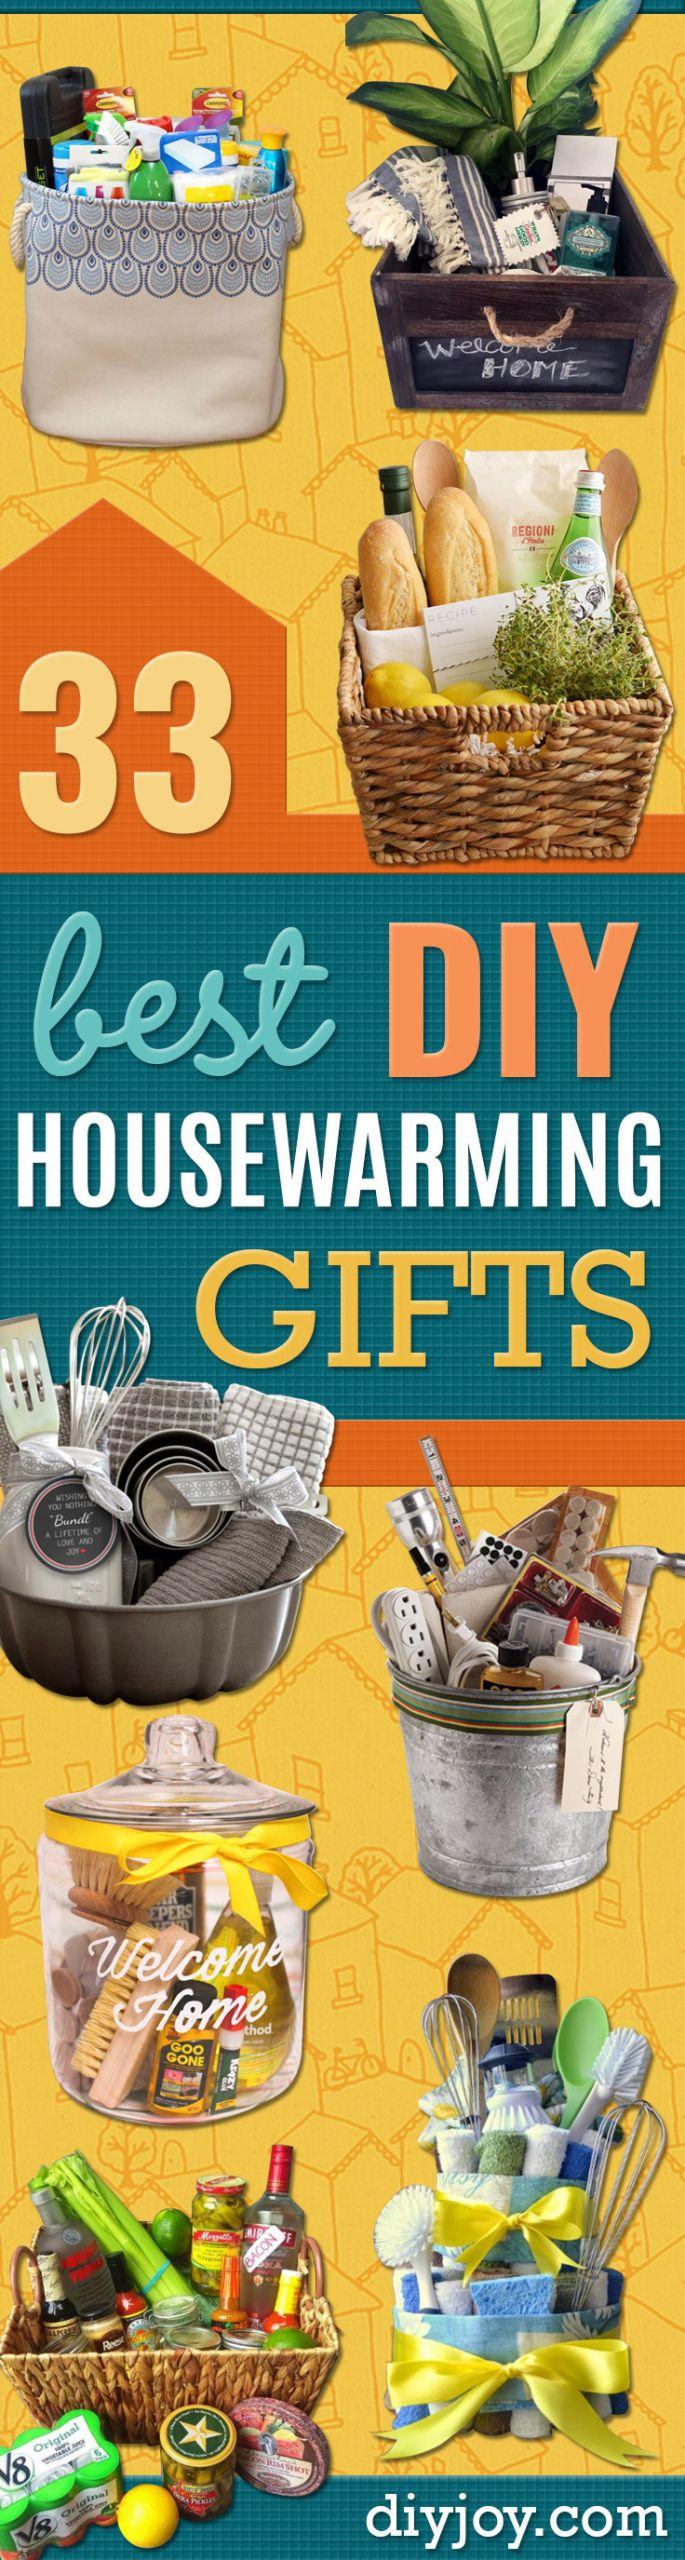 DIY Housewarming Gifts Ideas  33 Best DIY Housewarming Gifts